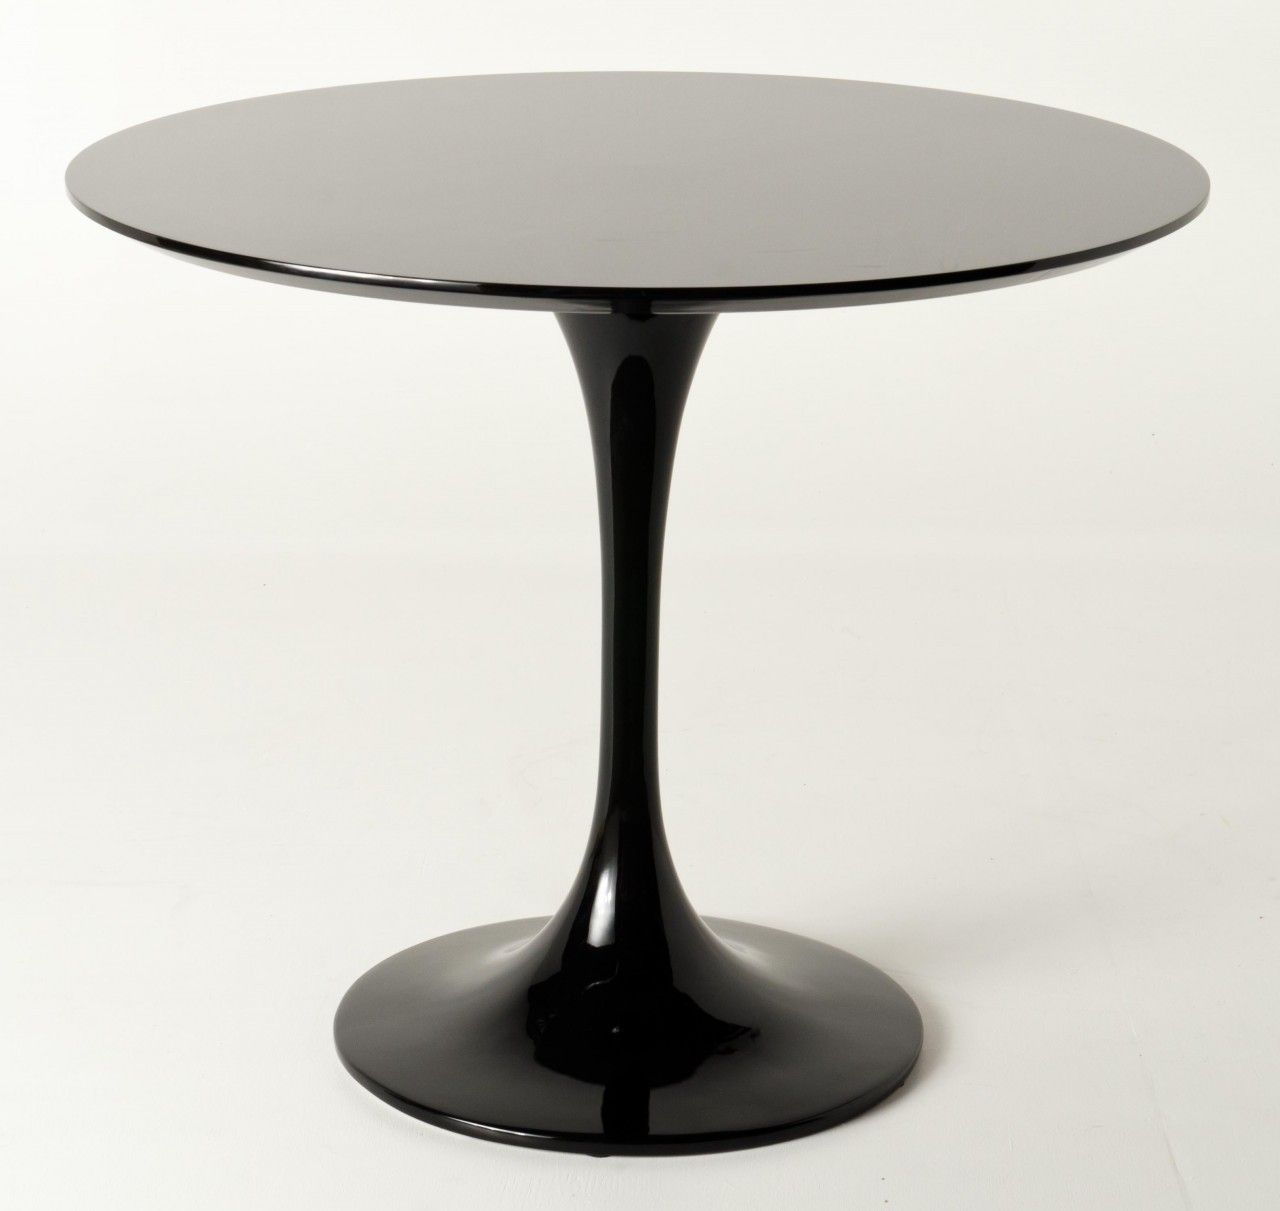 Eero saarinen table de salle manger tulip table 80cm for Table salle a manger 80 cm